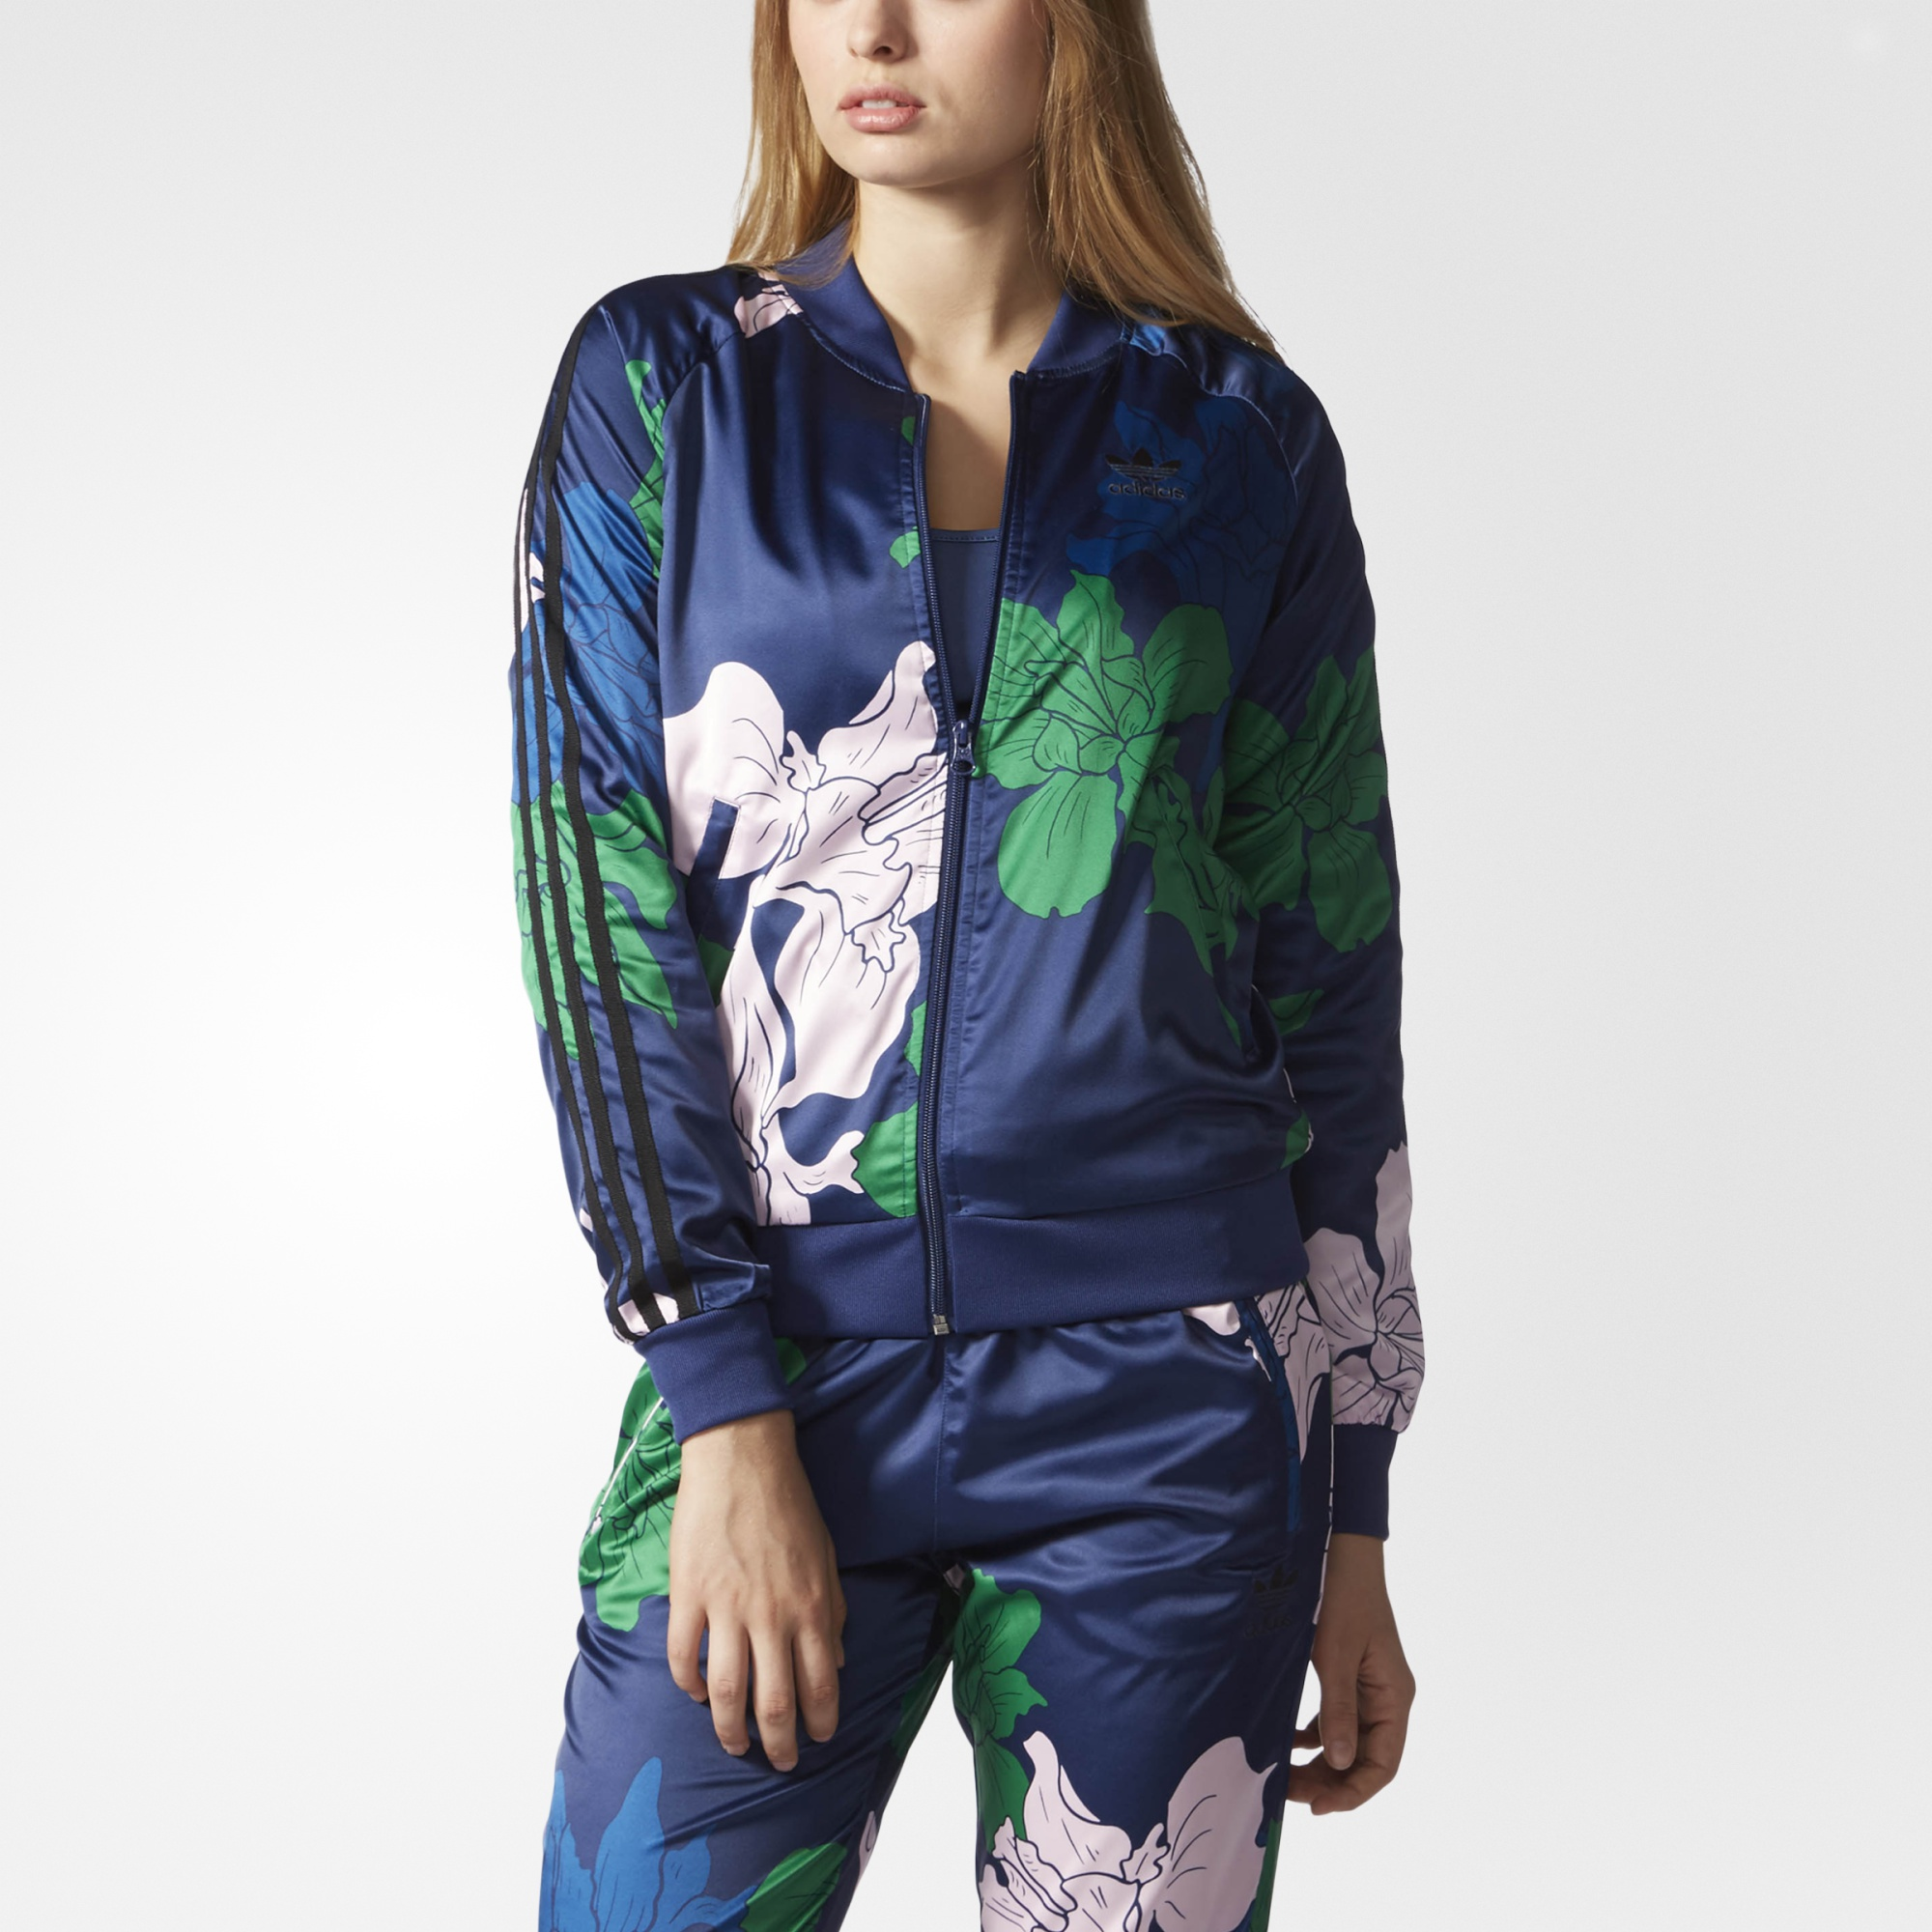 Adidas Originals Floral Engraving Supergirl r. XXS